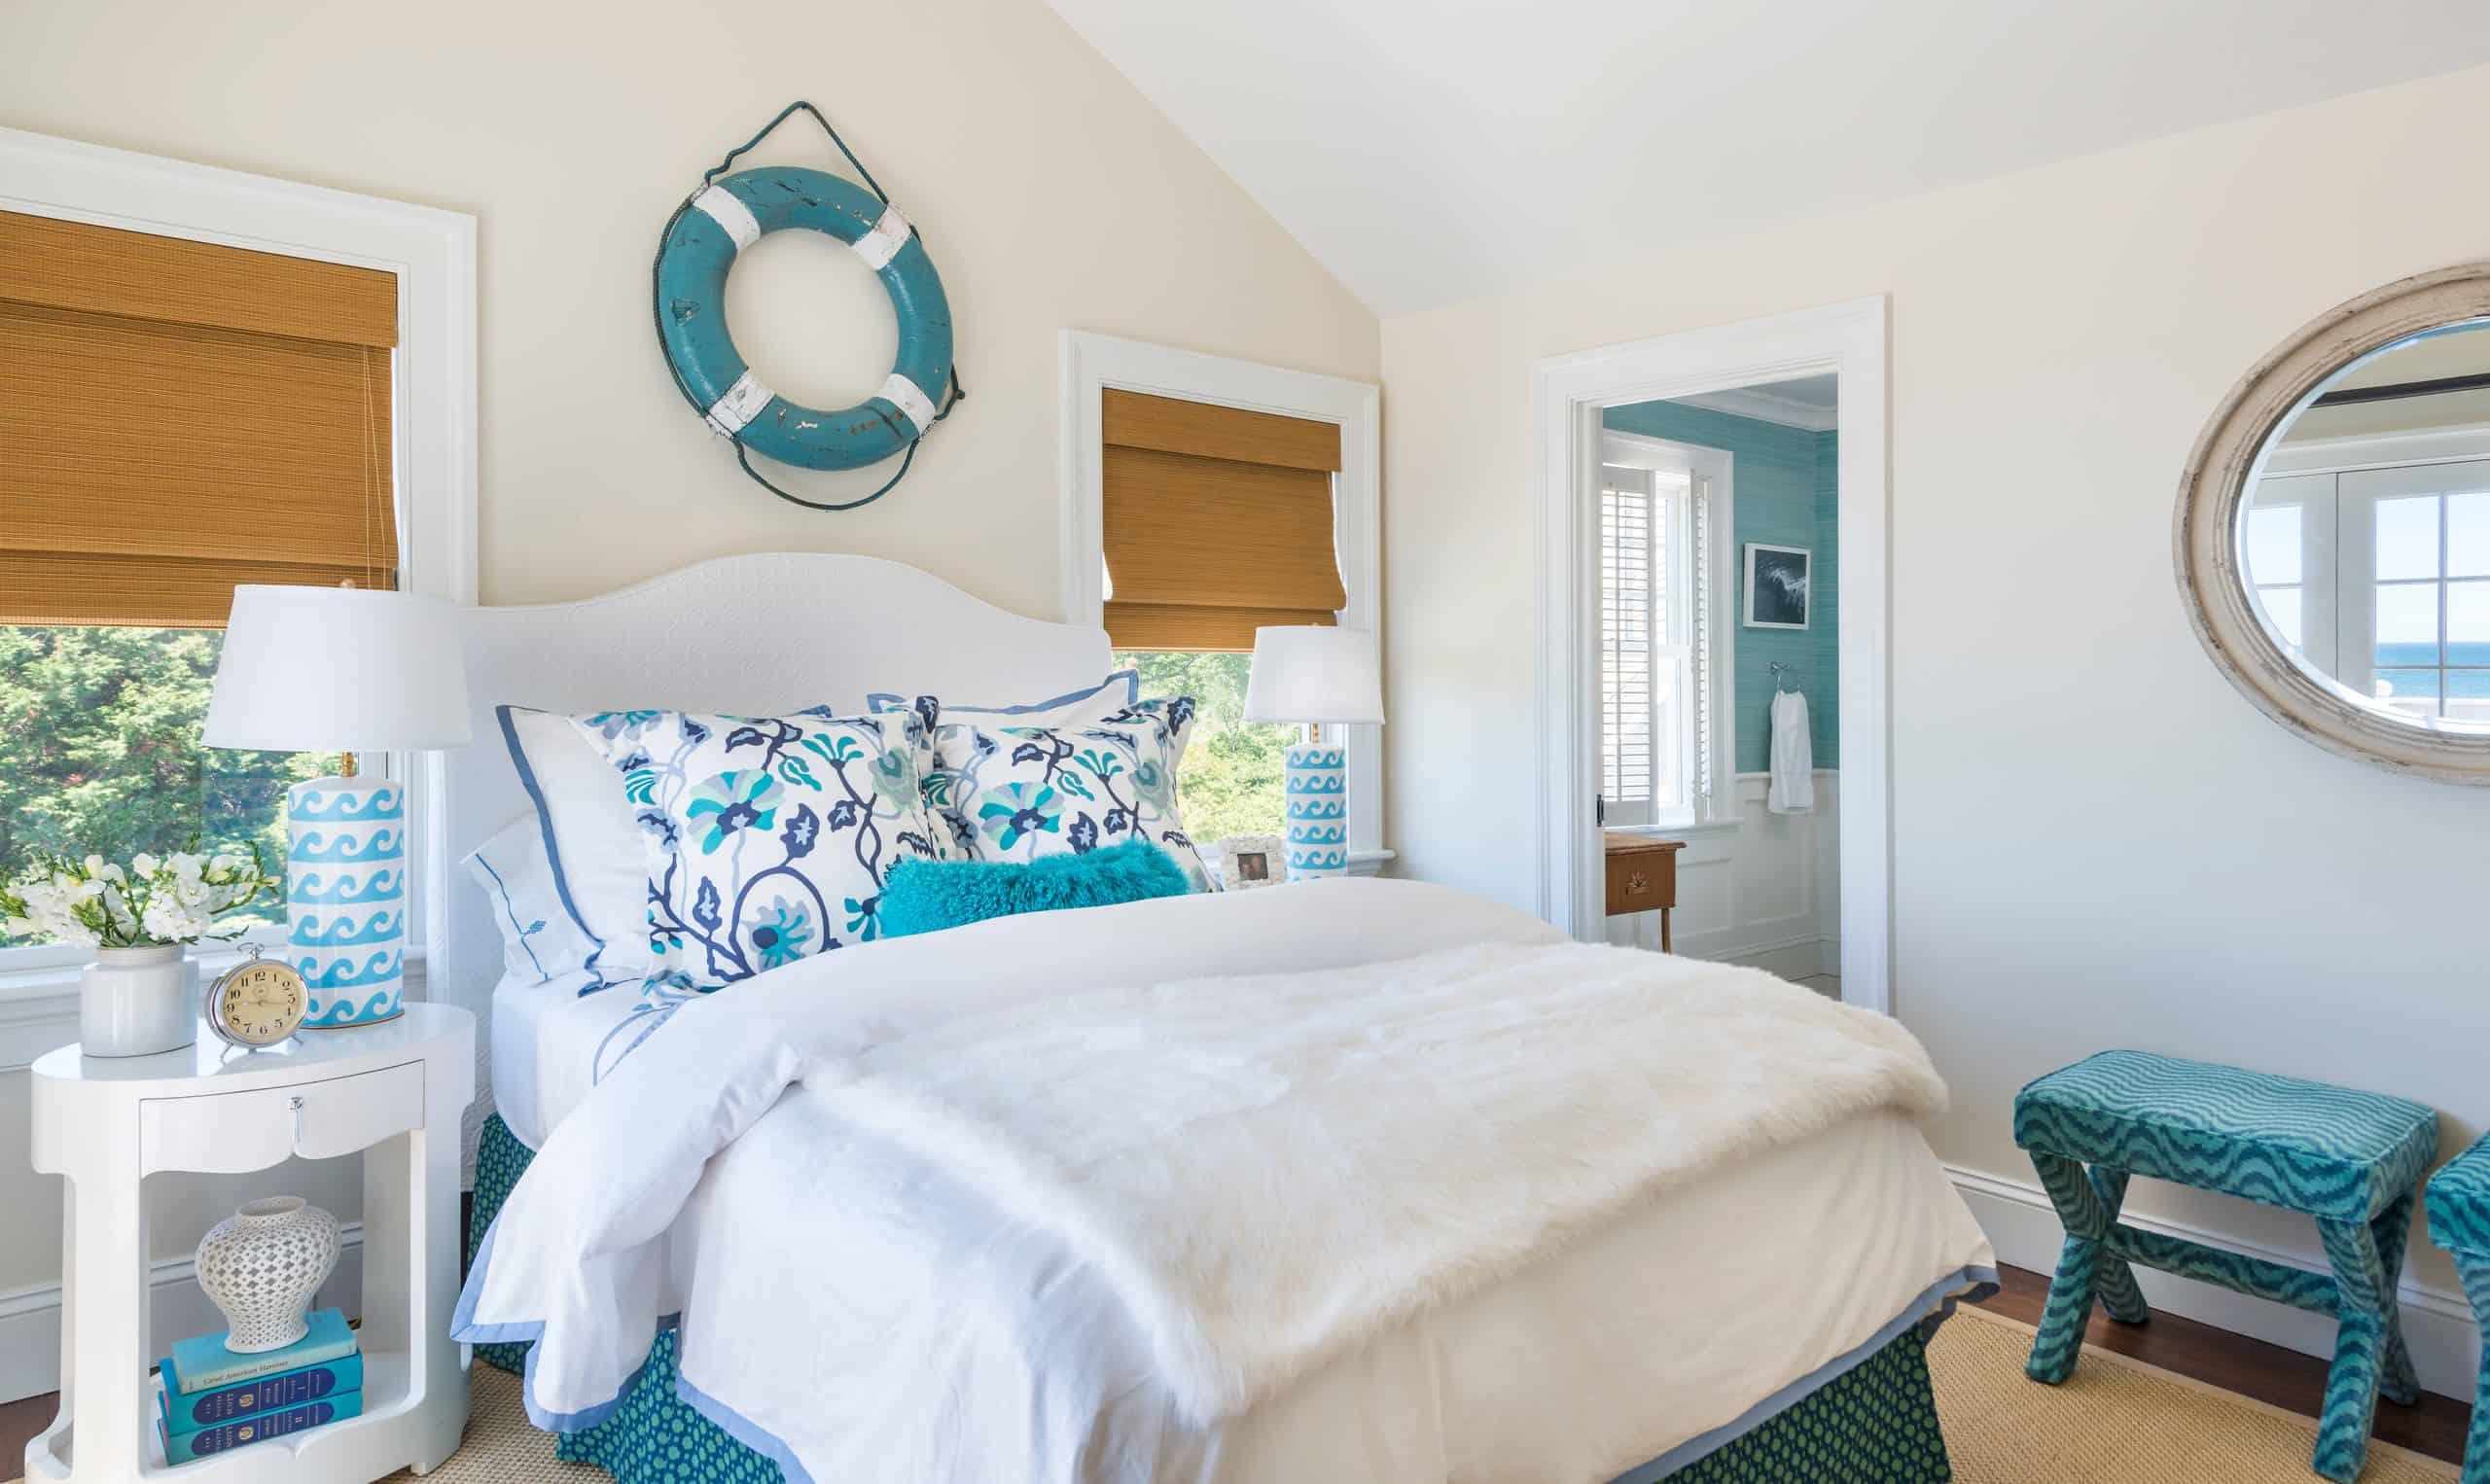 Coastal decor paint palettes for Lake Cowichan vacation properties for sale